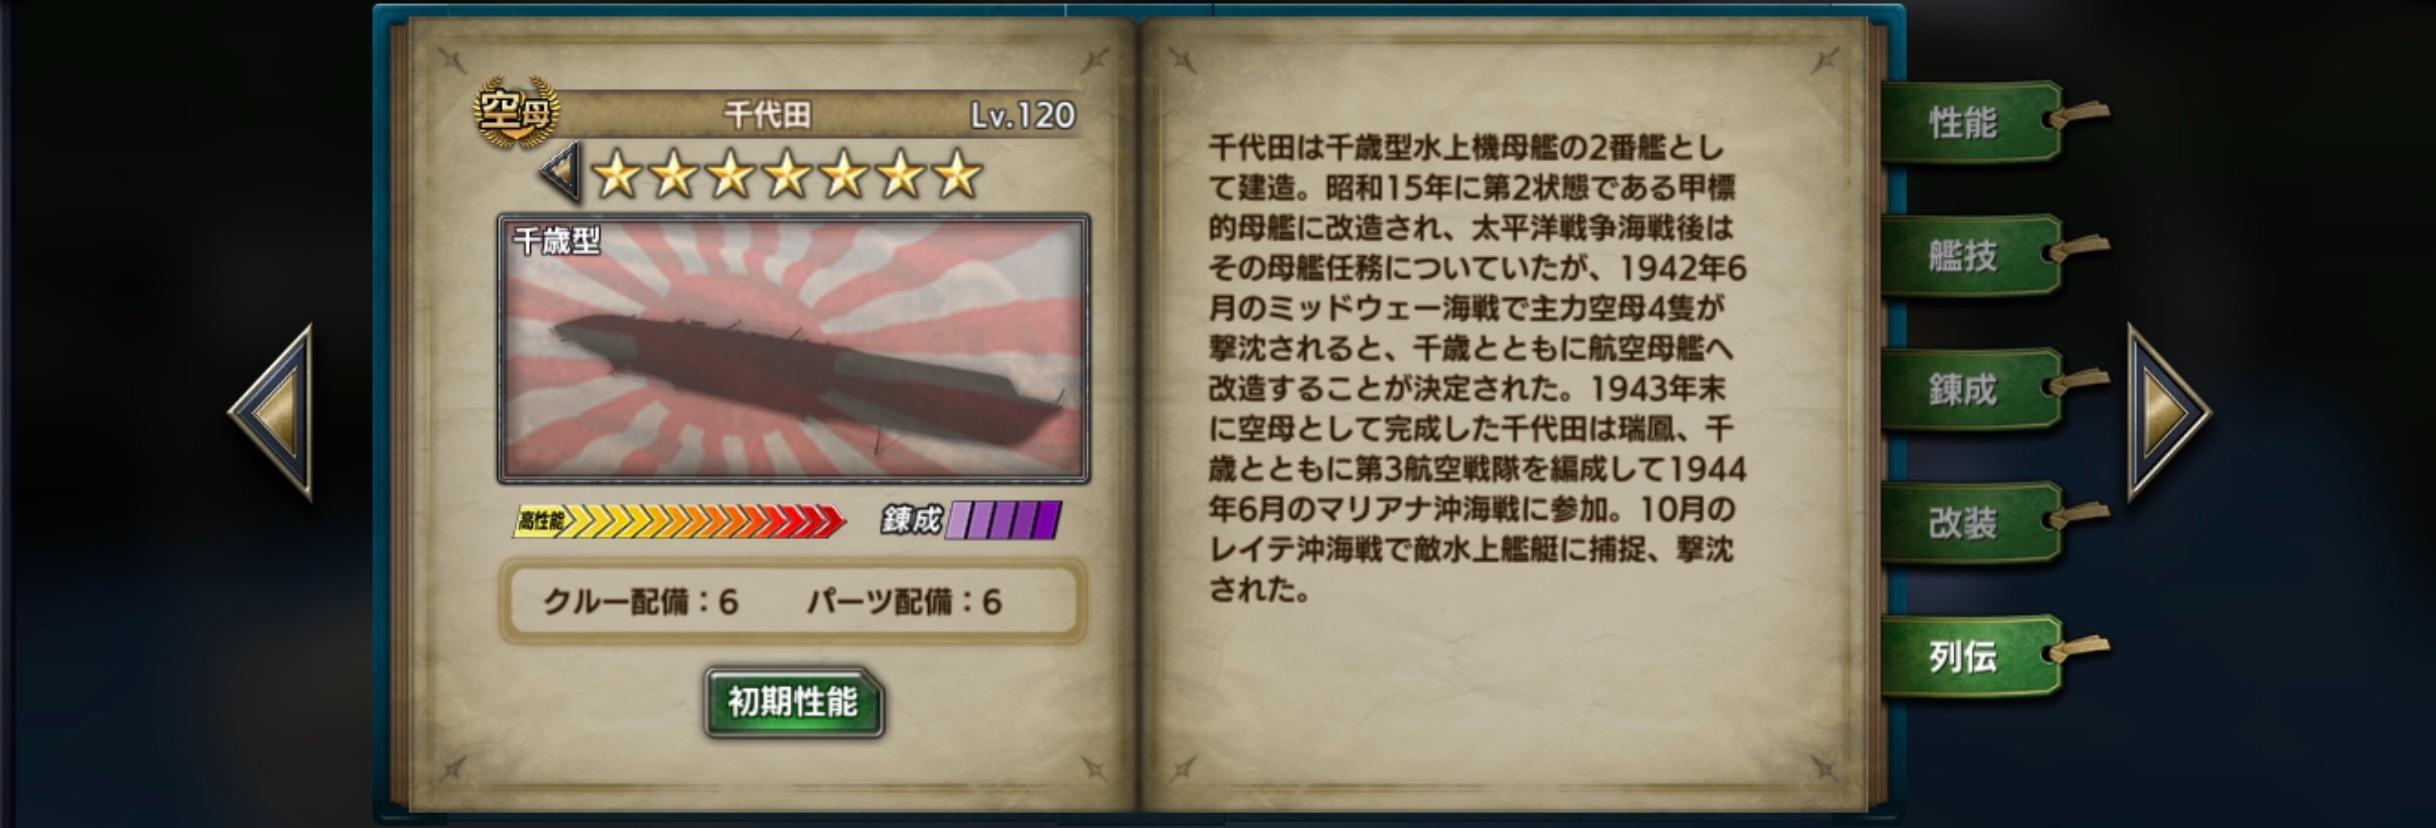 chiyoda-history